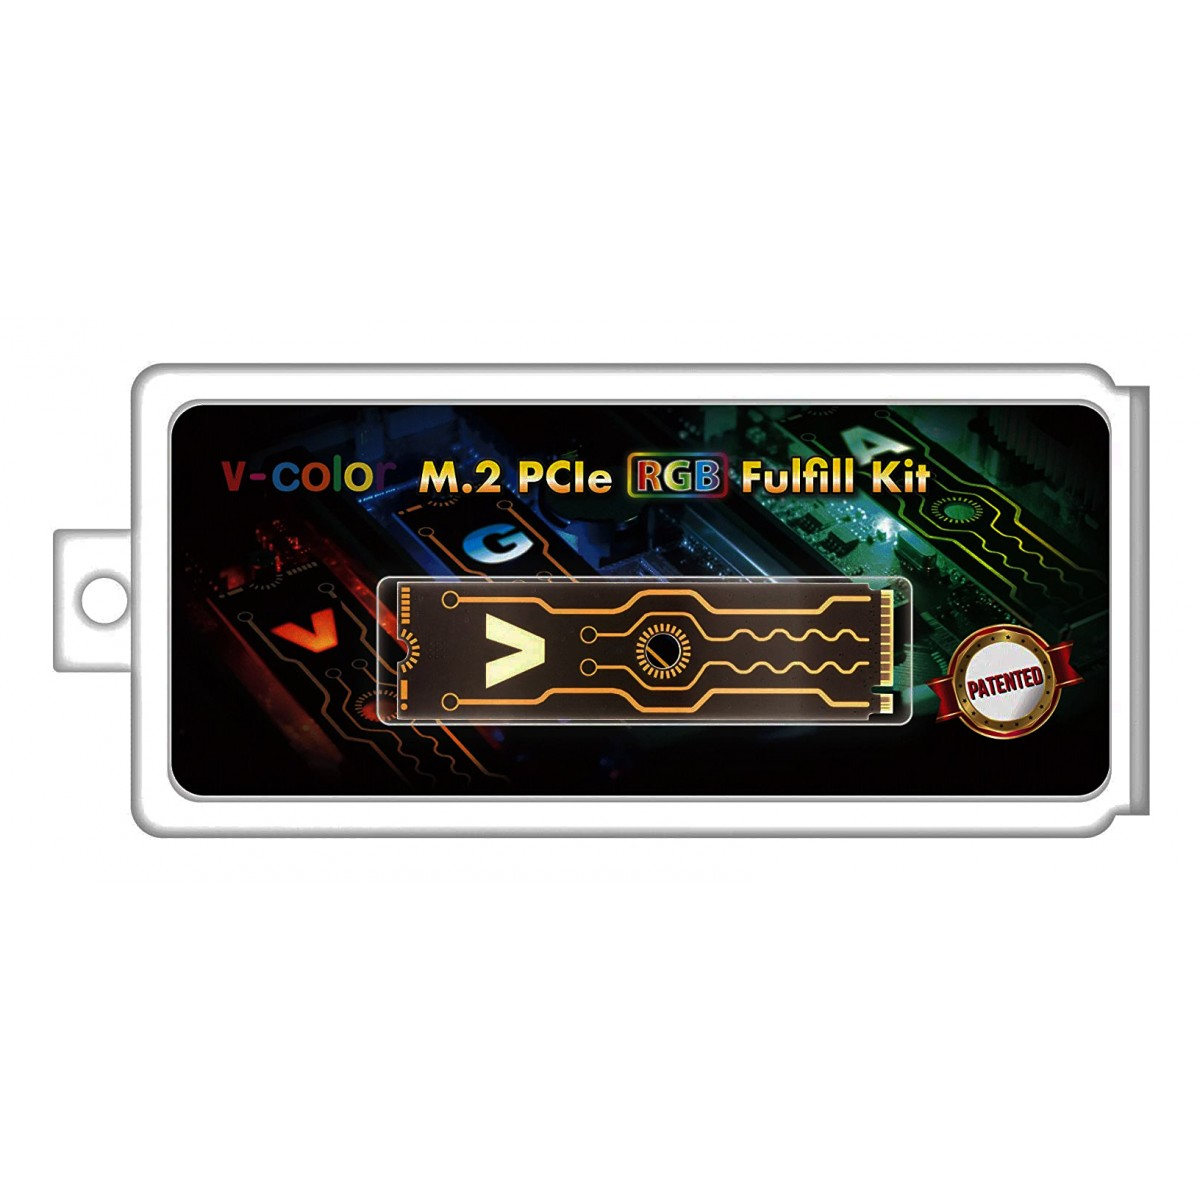 Case para SSD M.2 V-Color, 2280, PCIe, RGB Fulfill Kit, VPM2F001